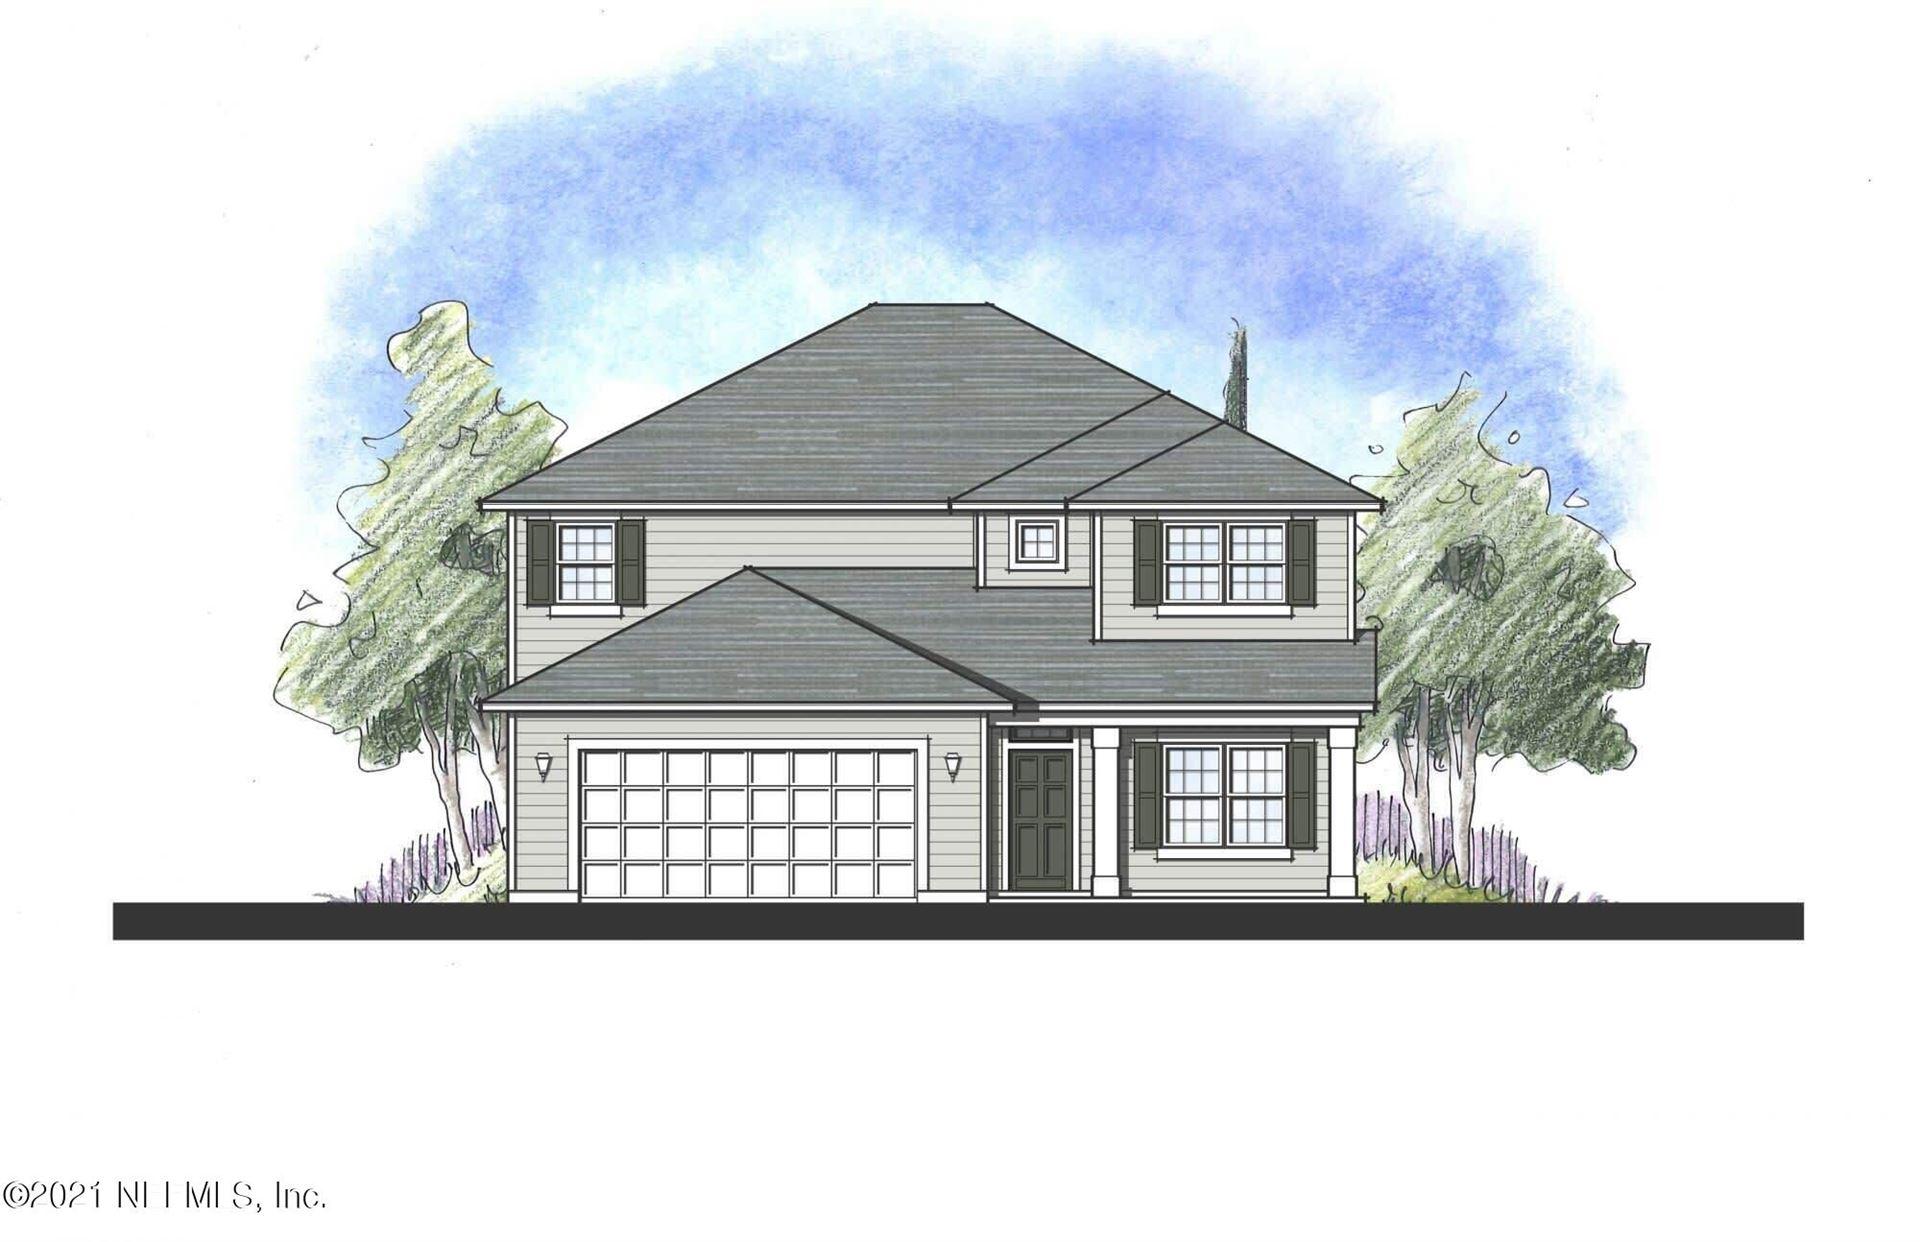 809 LAUREL VALLEY DR #Lot No: 193, Orange Park, FL 32065 - MLS#: 1100447